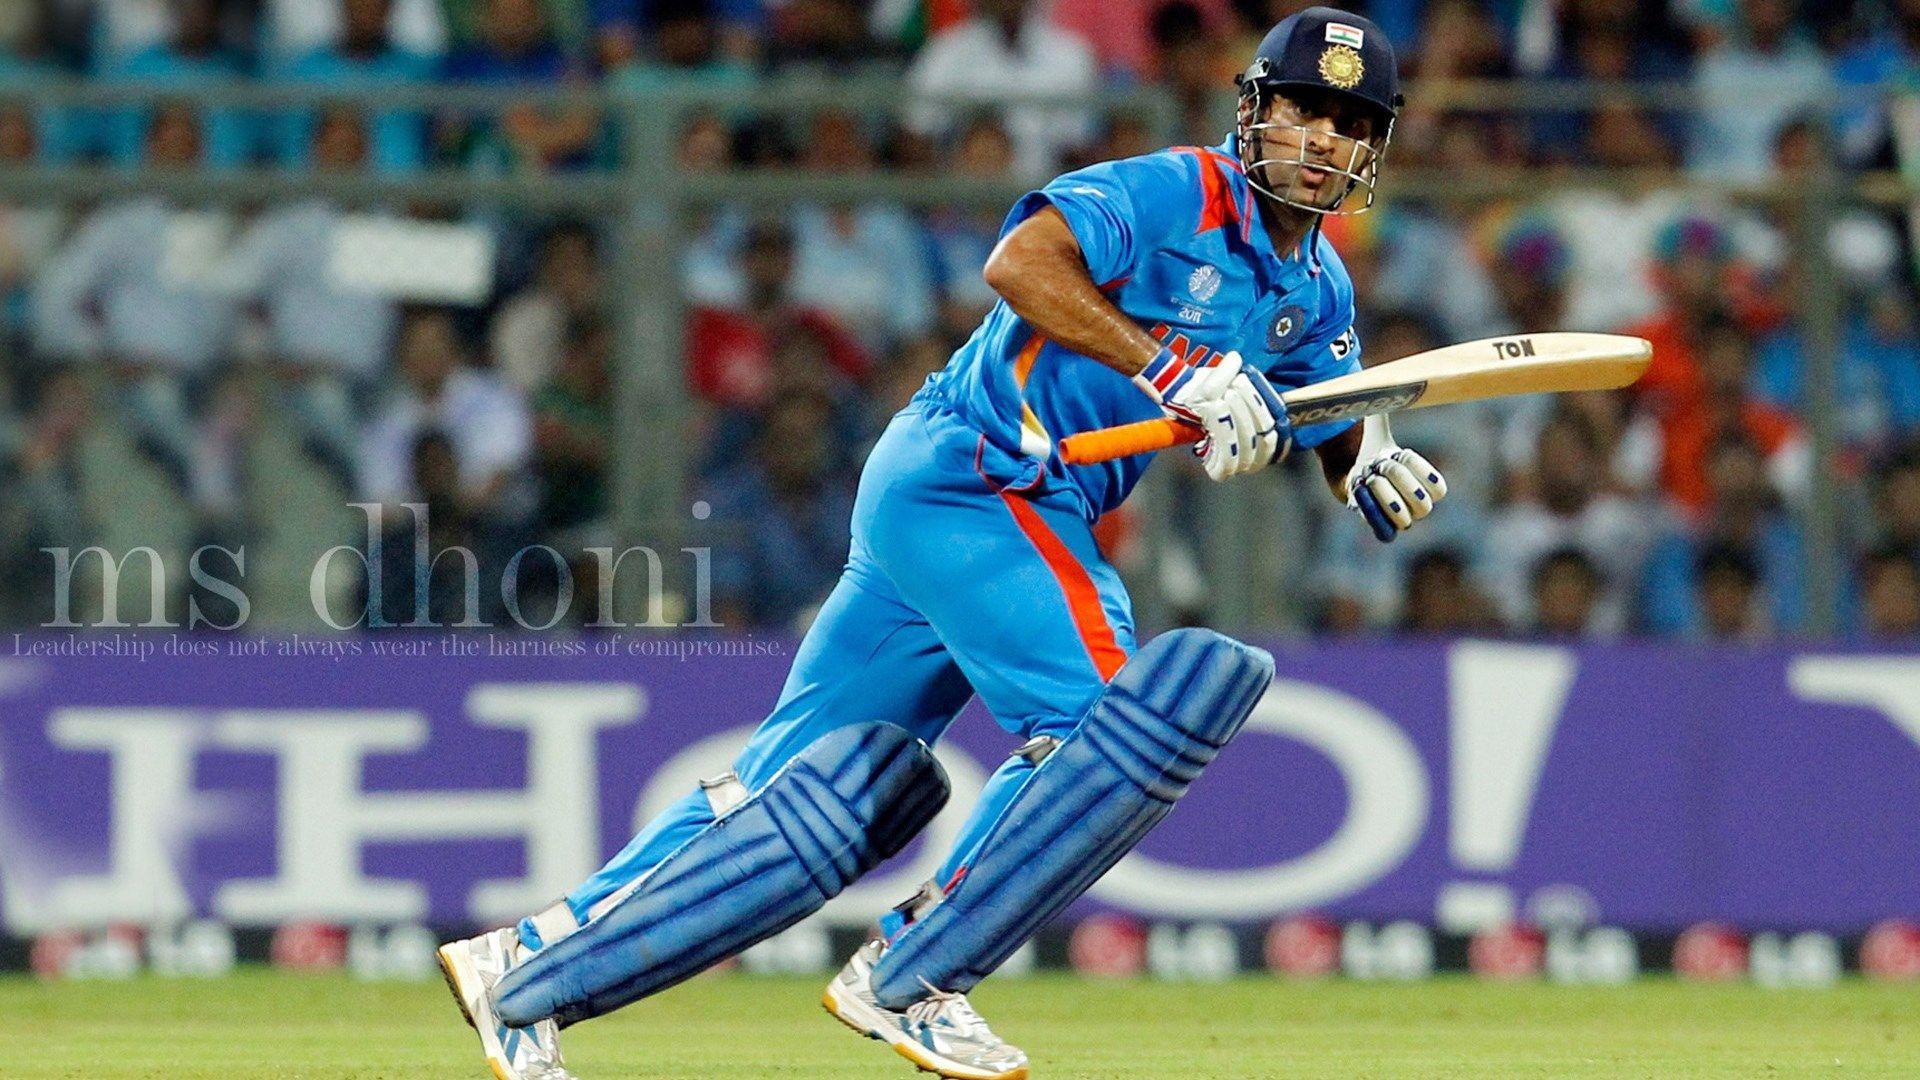 Mahendra Singh Dhoni Free For Desktop 1920x1080 Dhoni Wallpapers Cricket Teams Ms Dhoni Wallpapers